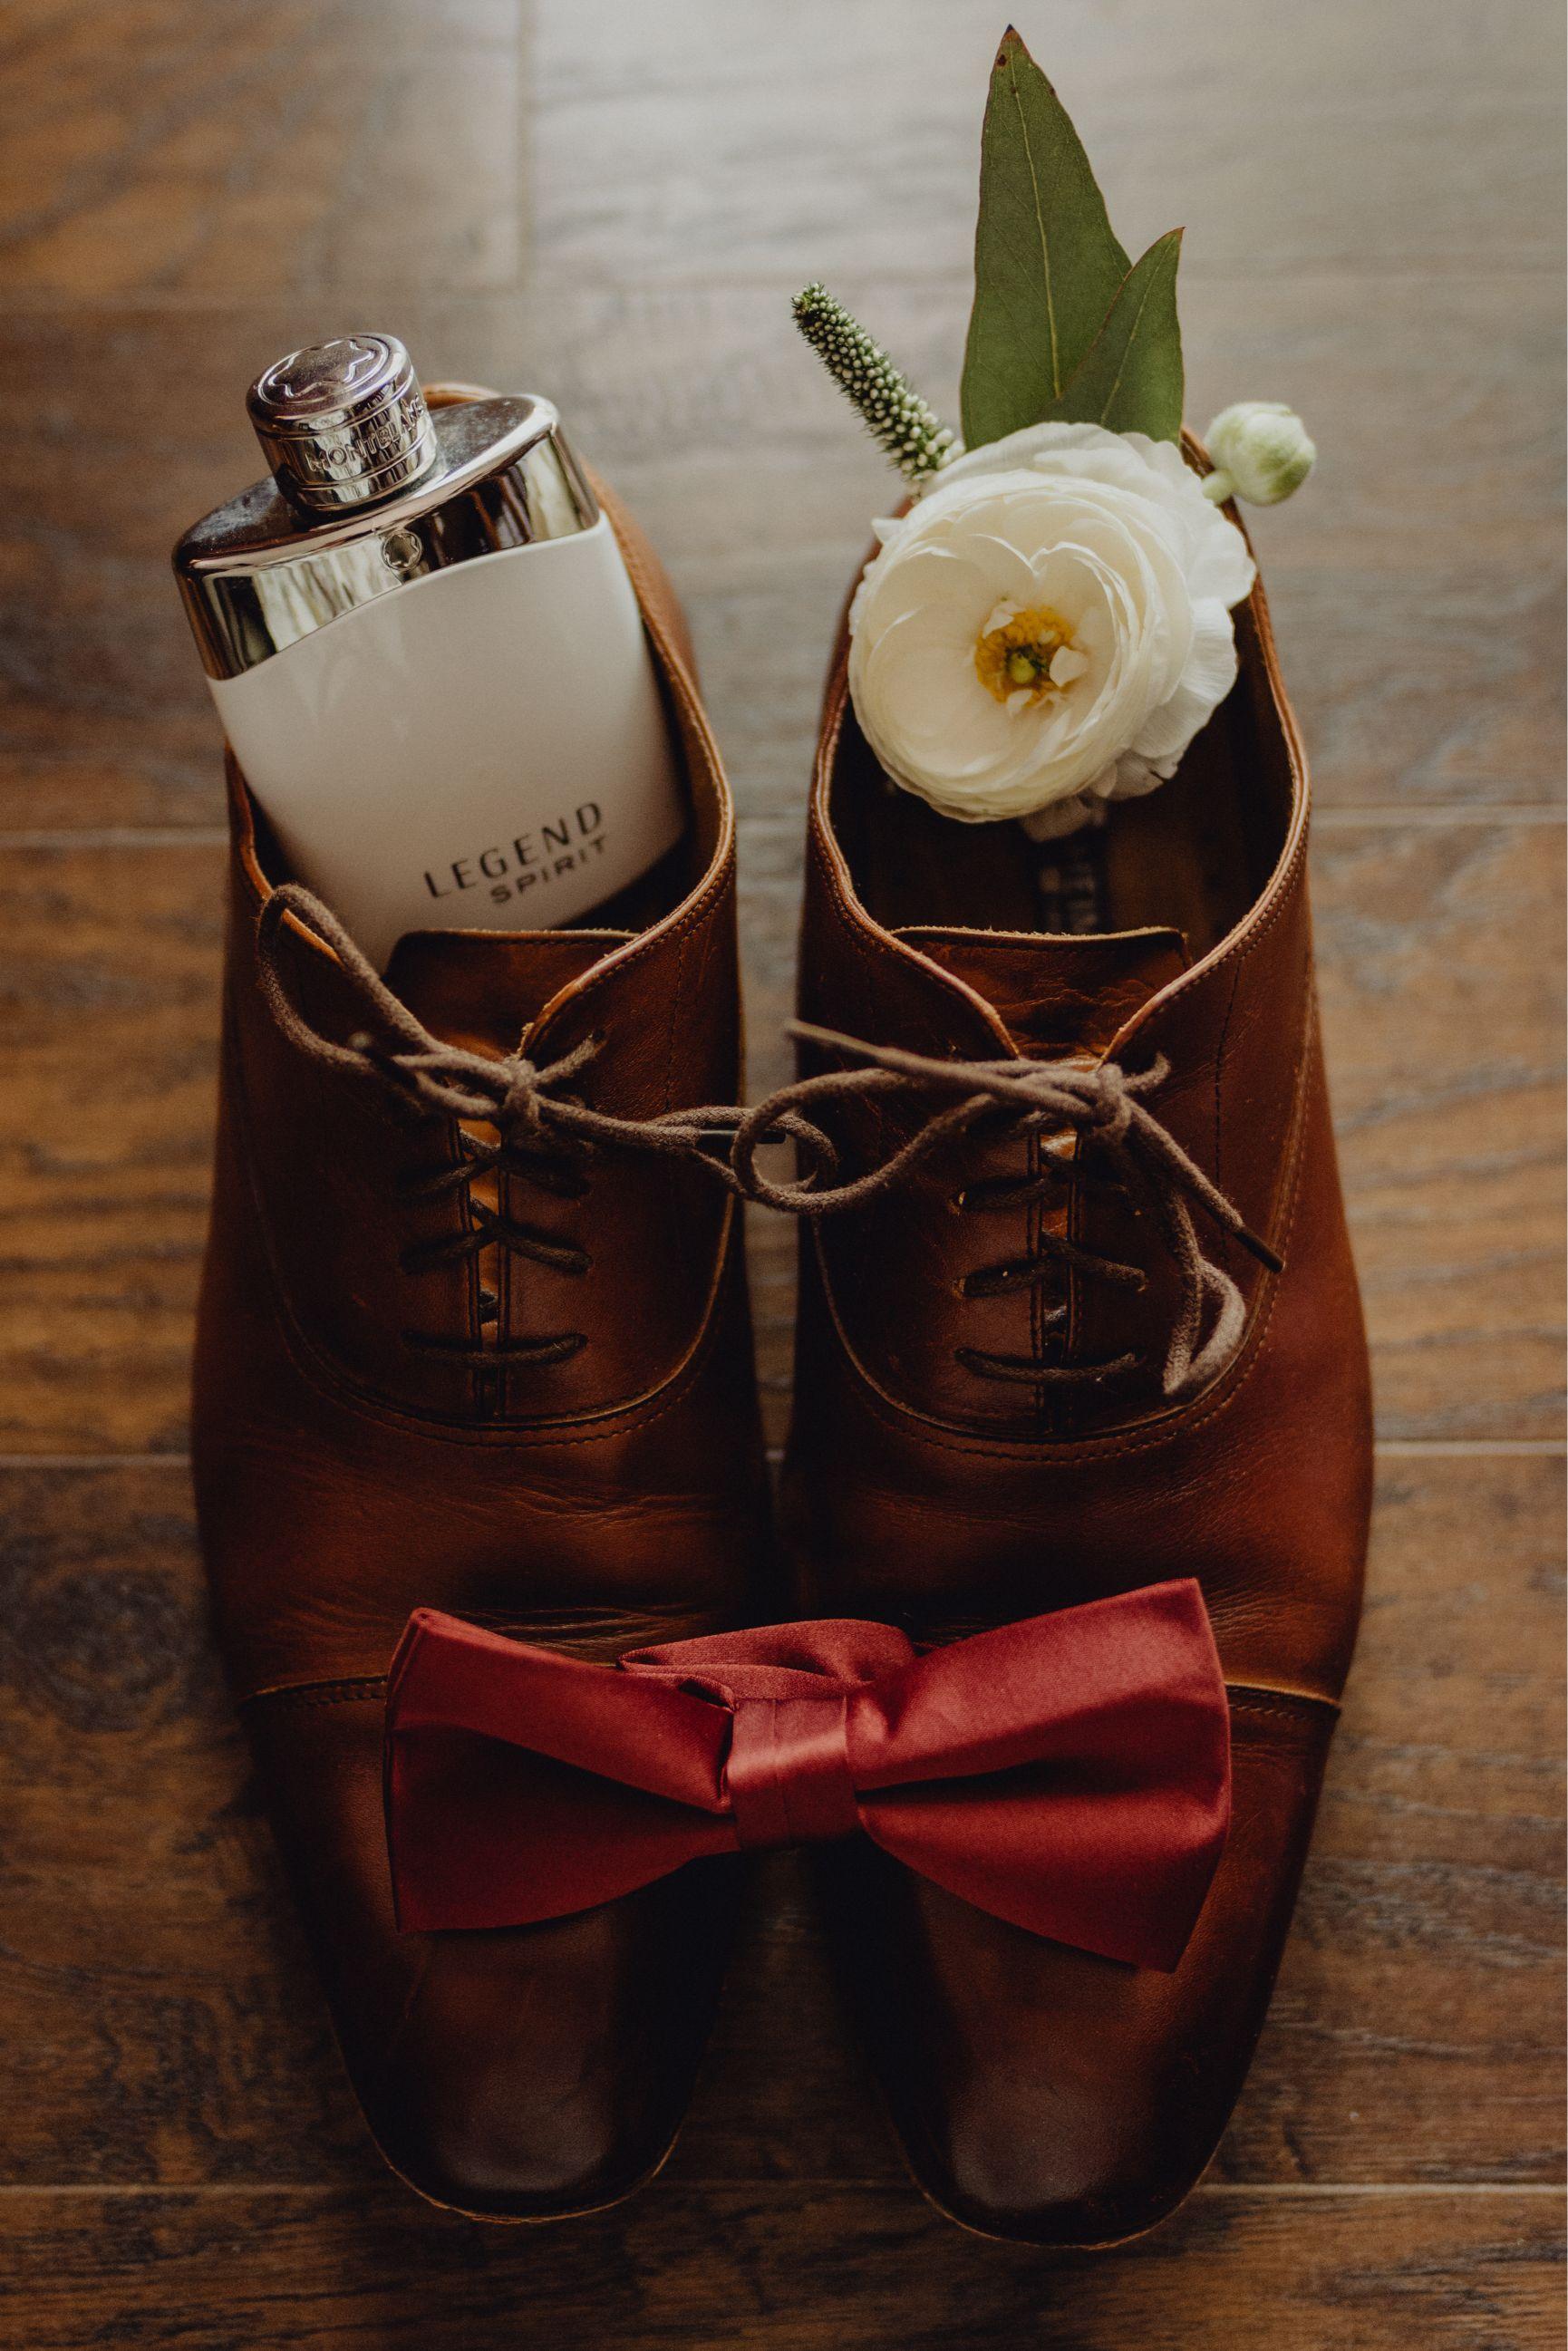 North-Dallas-Wedding-Florist-David-Co.-19.jpg